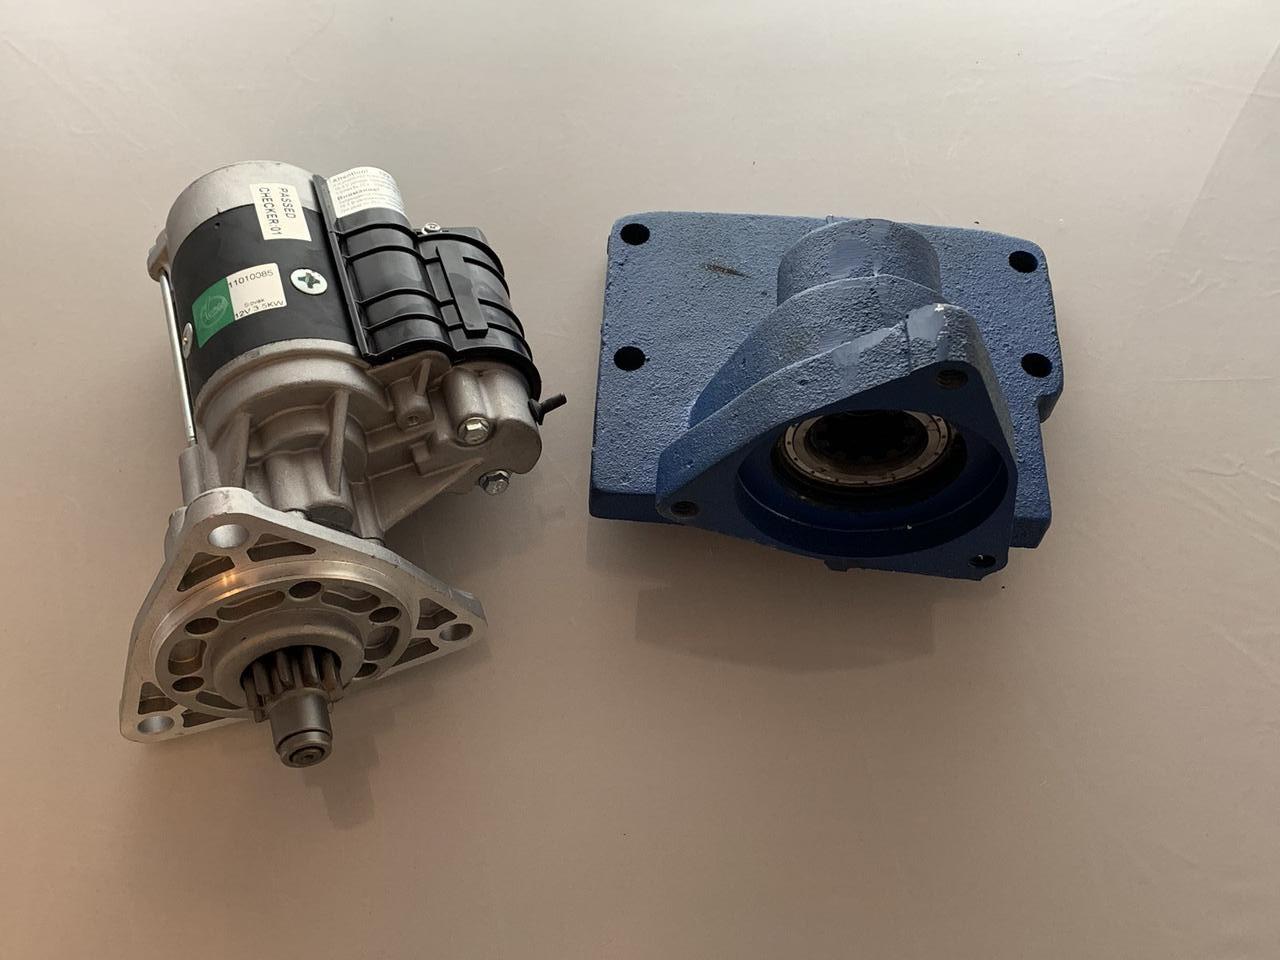 Комплект переоборудования МТЗ, ЮМЗ, Т-150, НИВА под стартер   переходник усилений, стартер Slovak 3.5квт